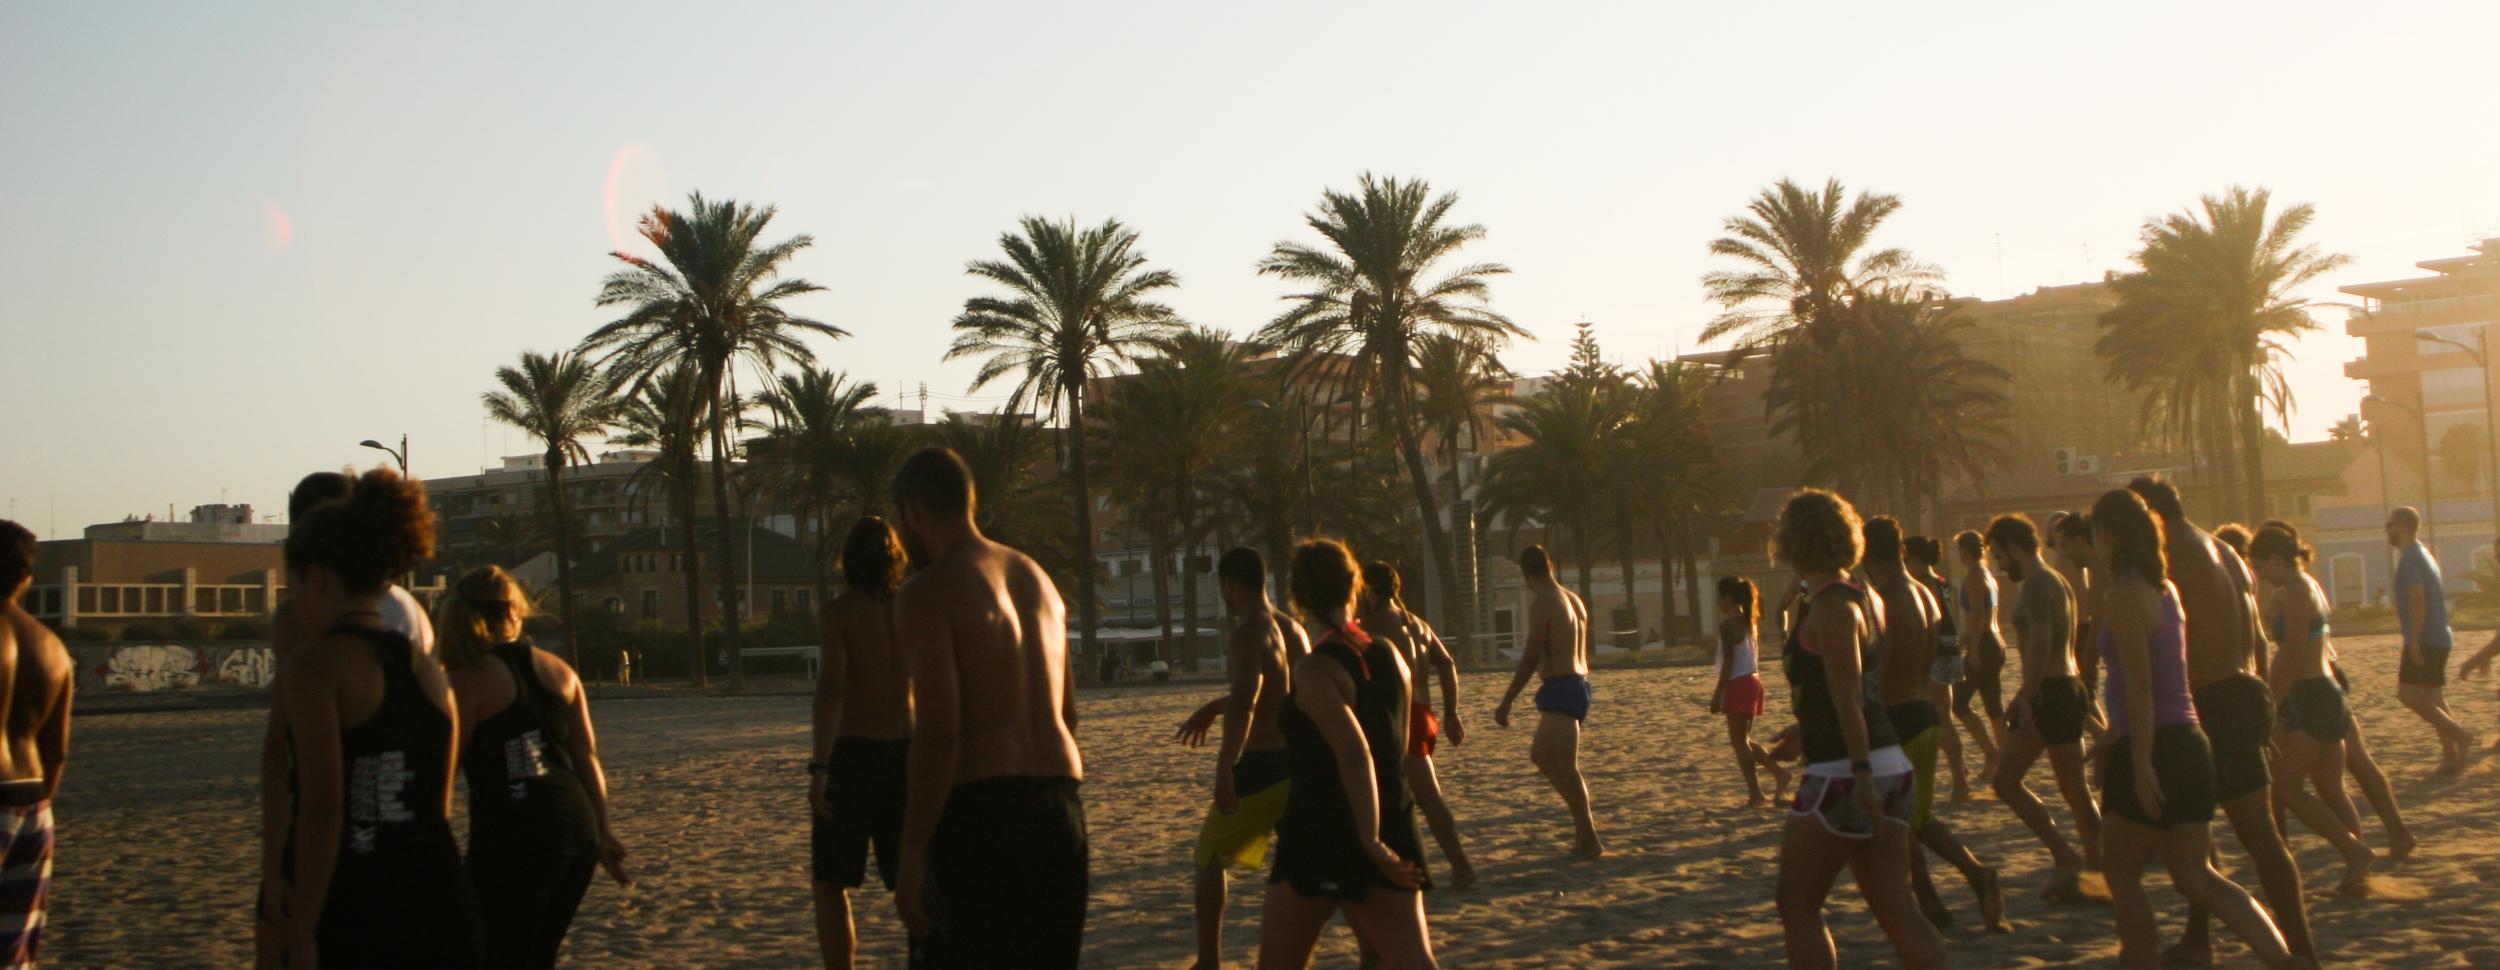 Full_CrossFit_Beach_Wod_V2_2015-2.jpg